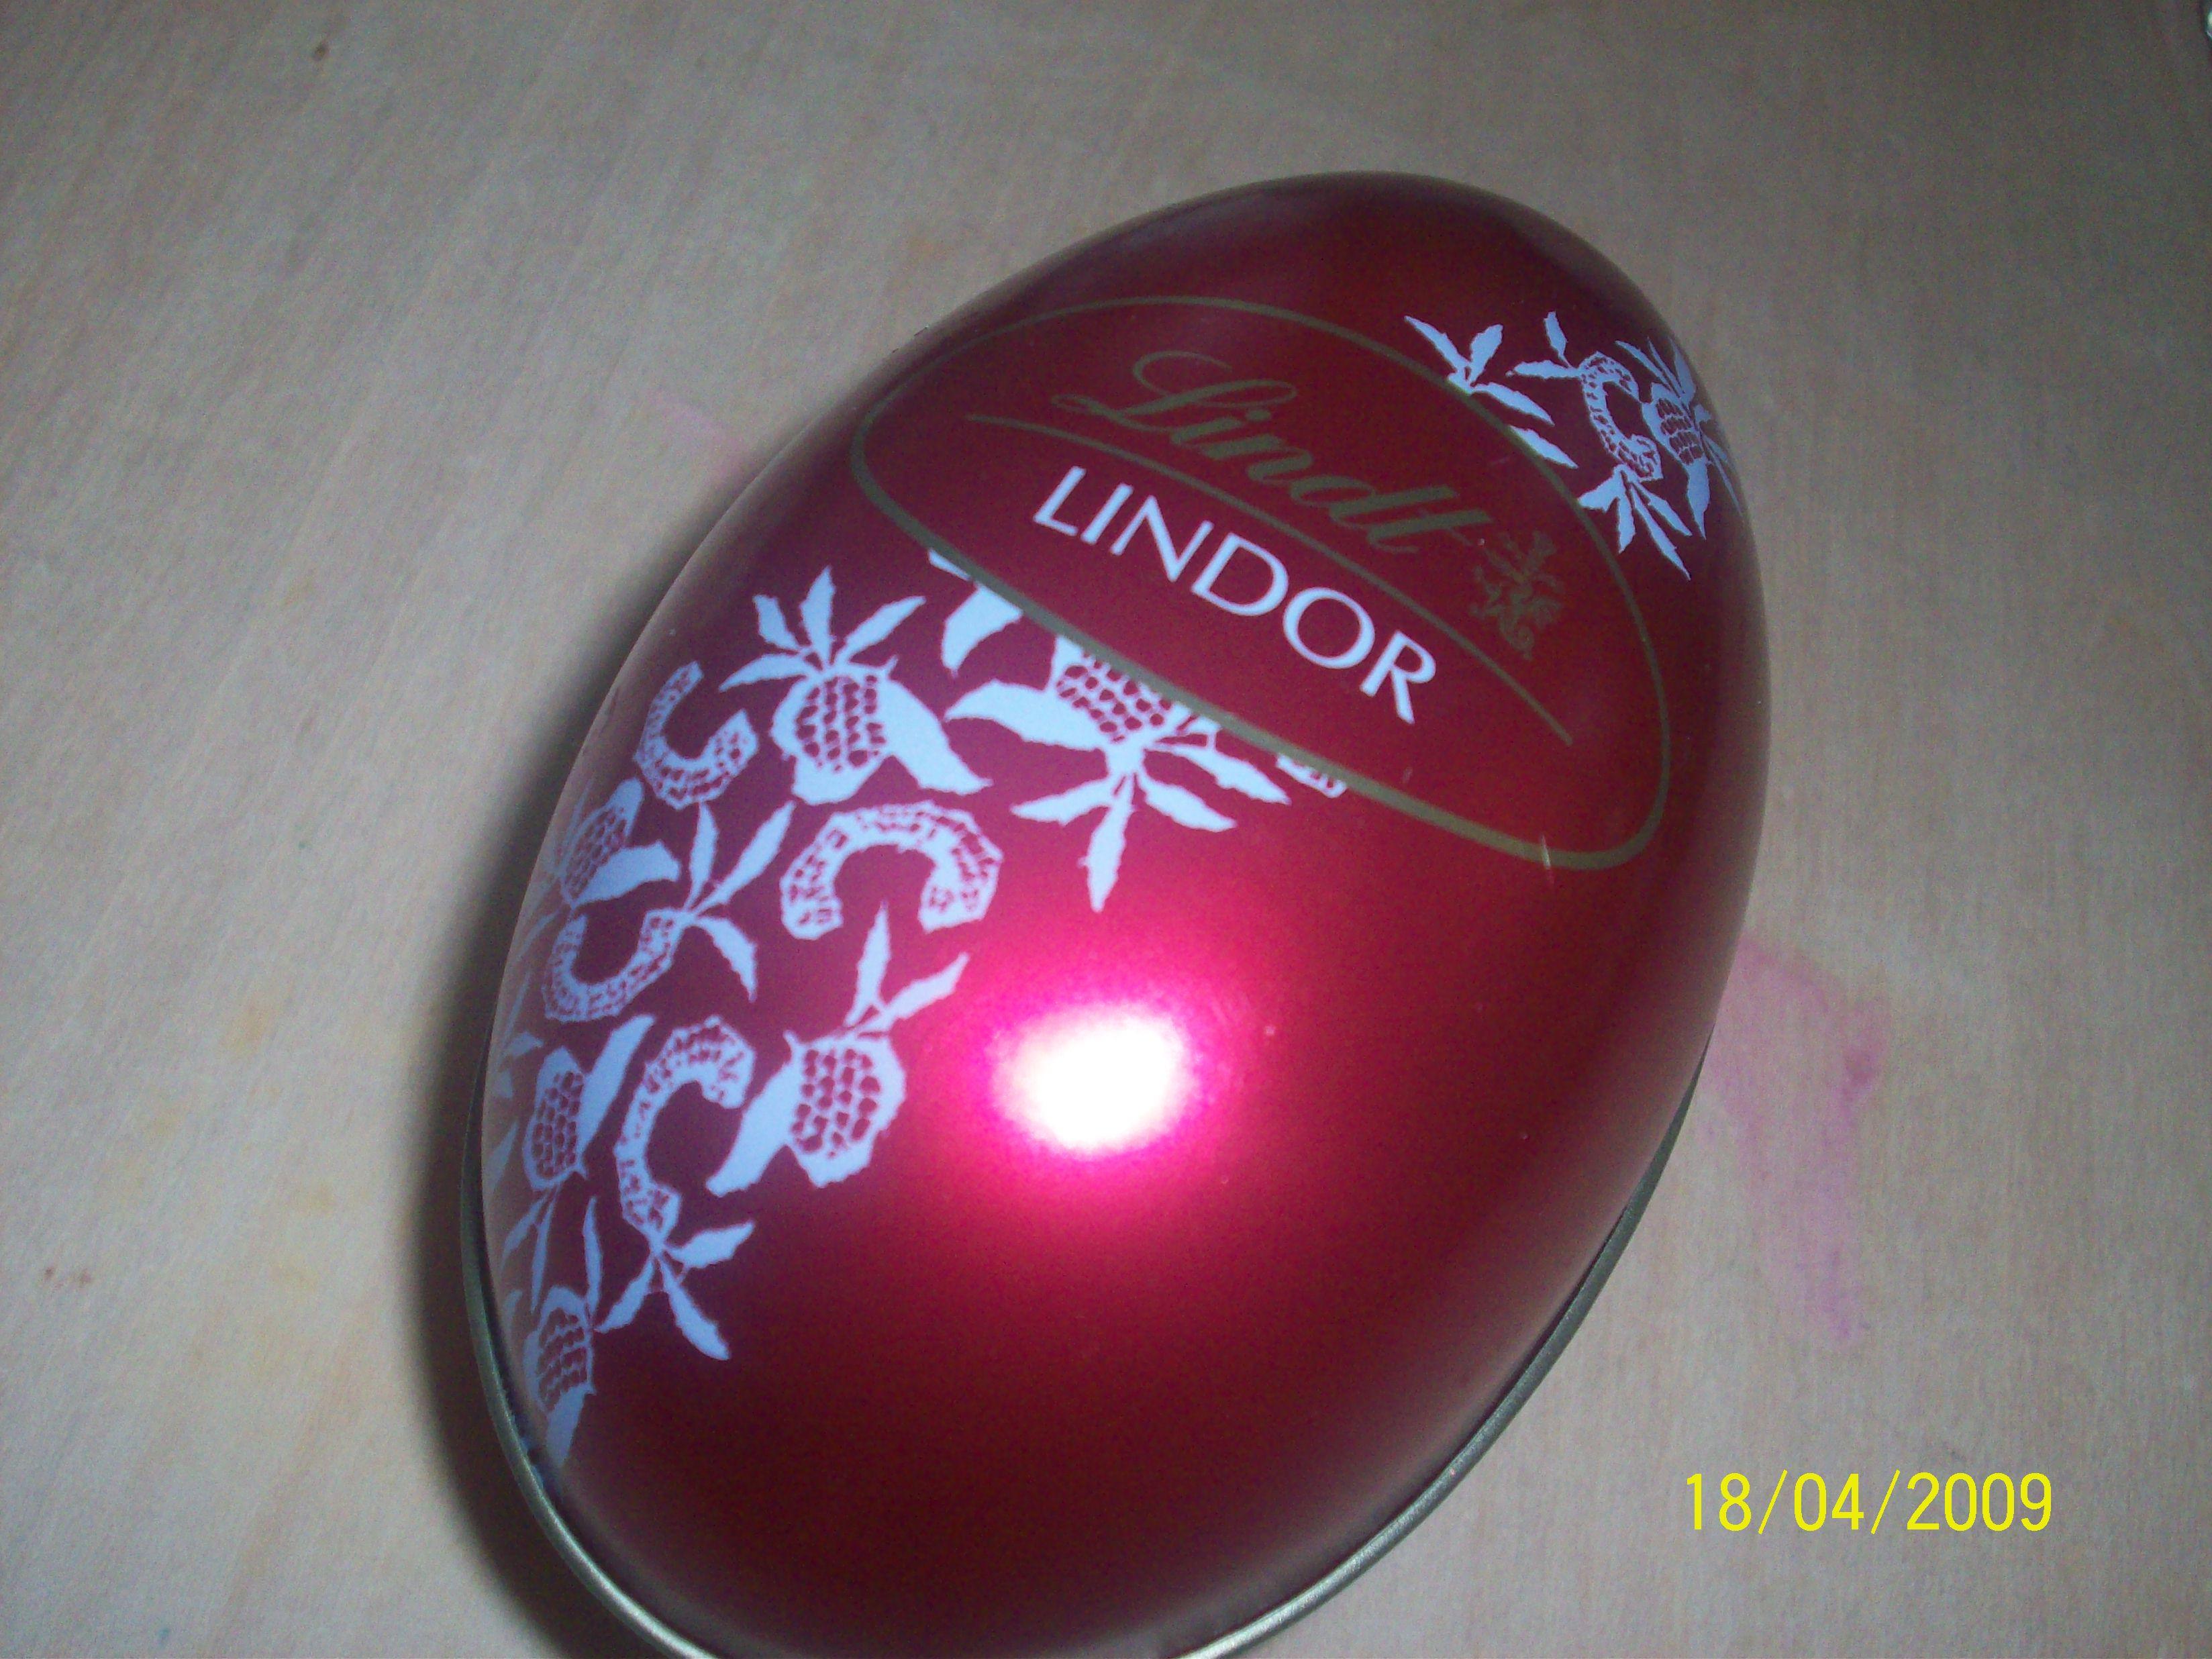 https://foodloader.net/cutie_2009-04-19_Lindt_Chocolate2.jpg